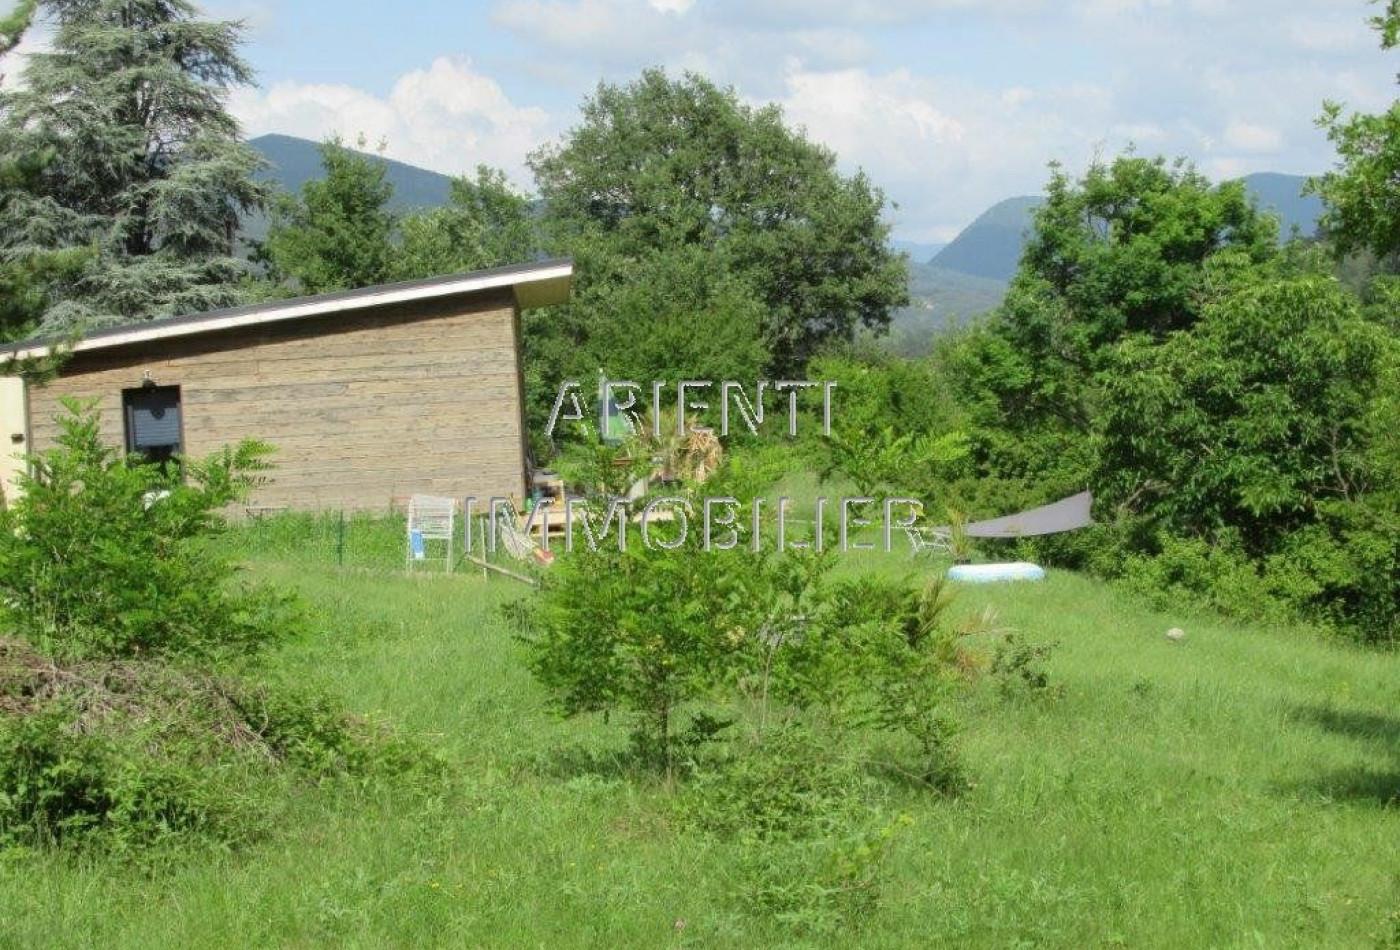 A vendre Dieulefit 260012776 Office immobilier arienti